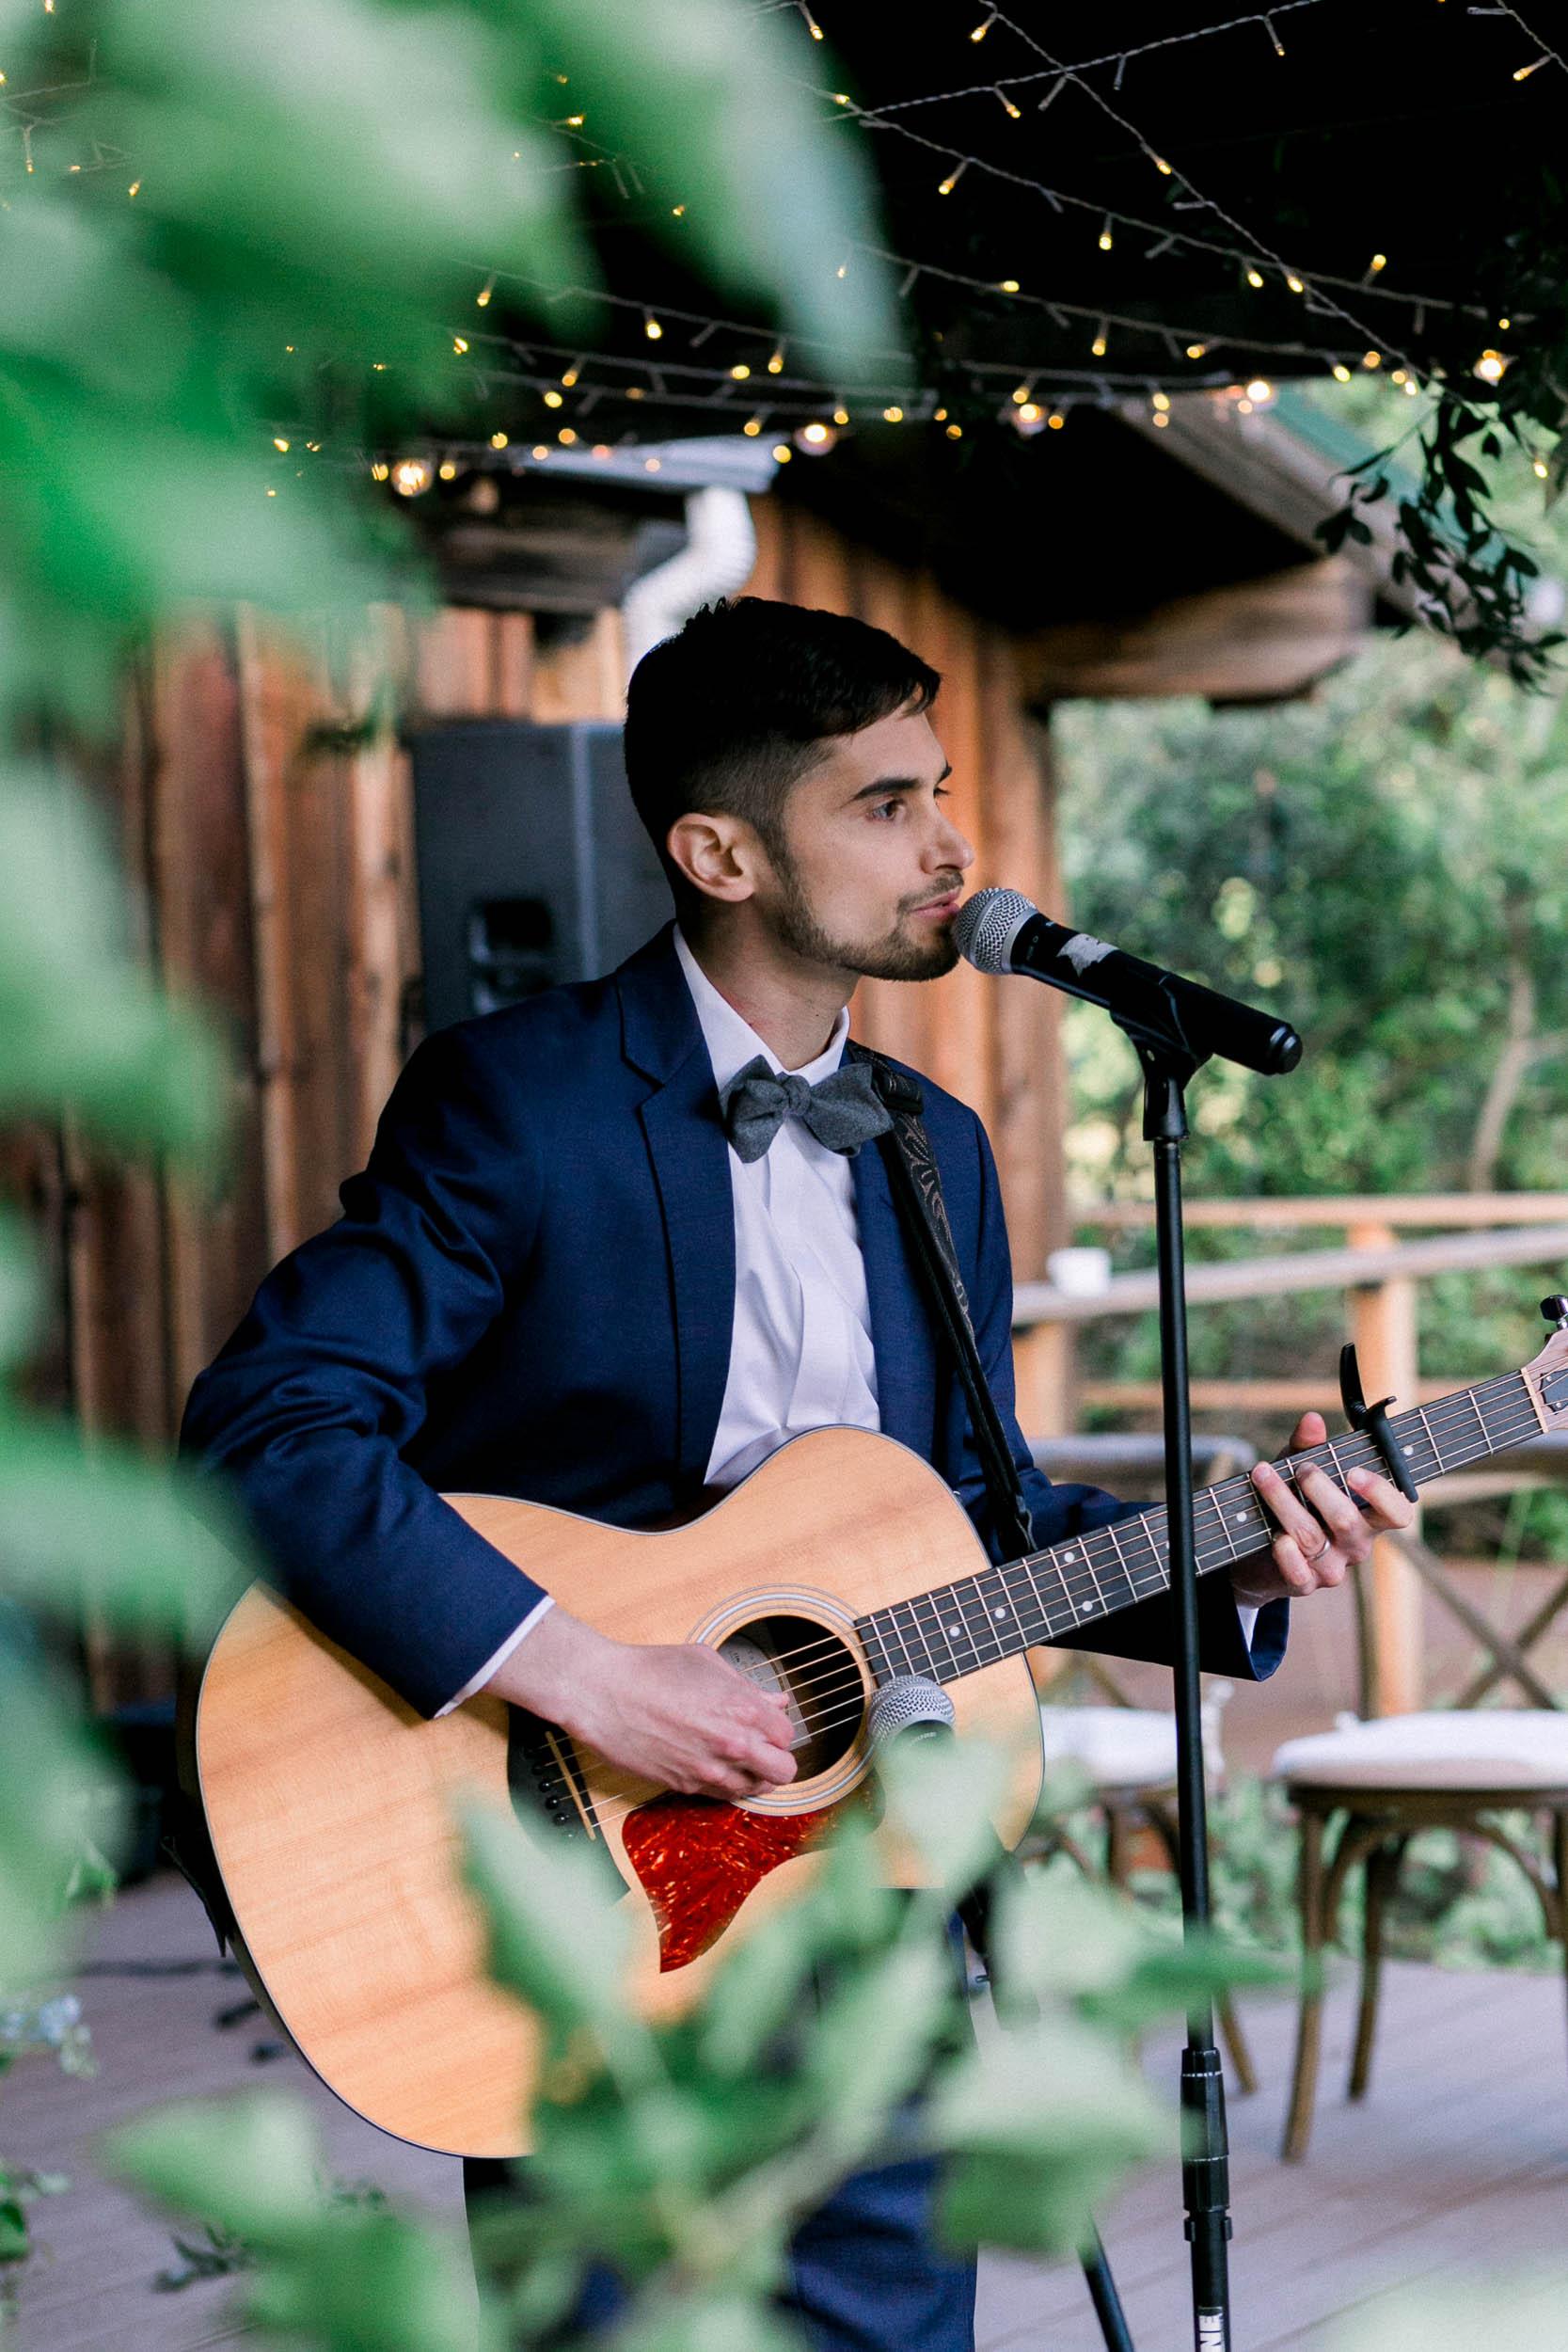 052519_B+S_Hidden Villa Wedding_Buena Lane Photography__TP14297.jpg